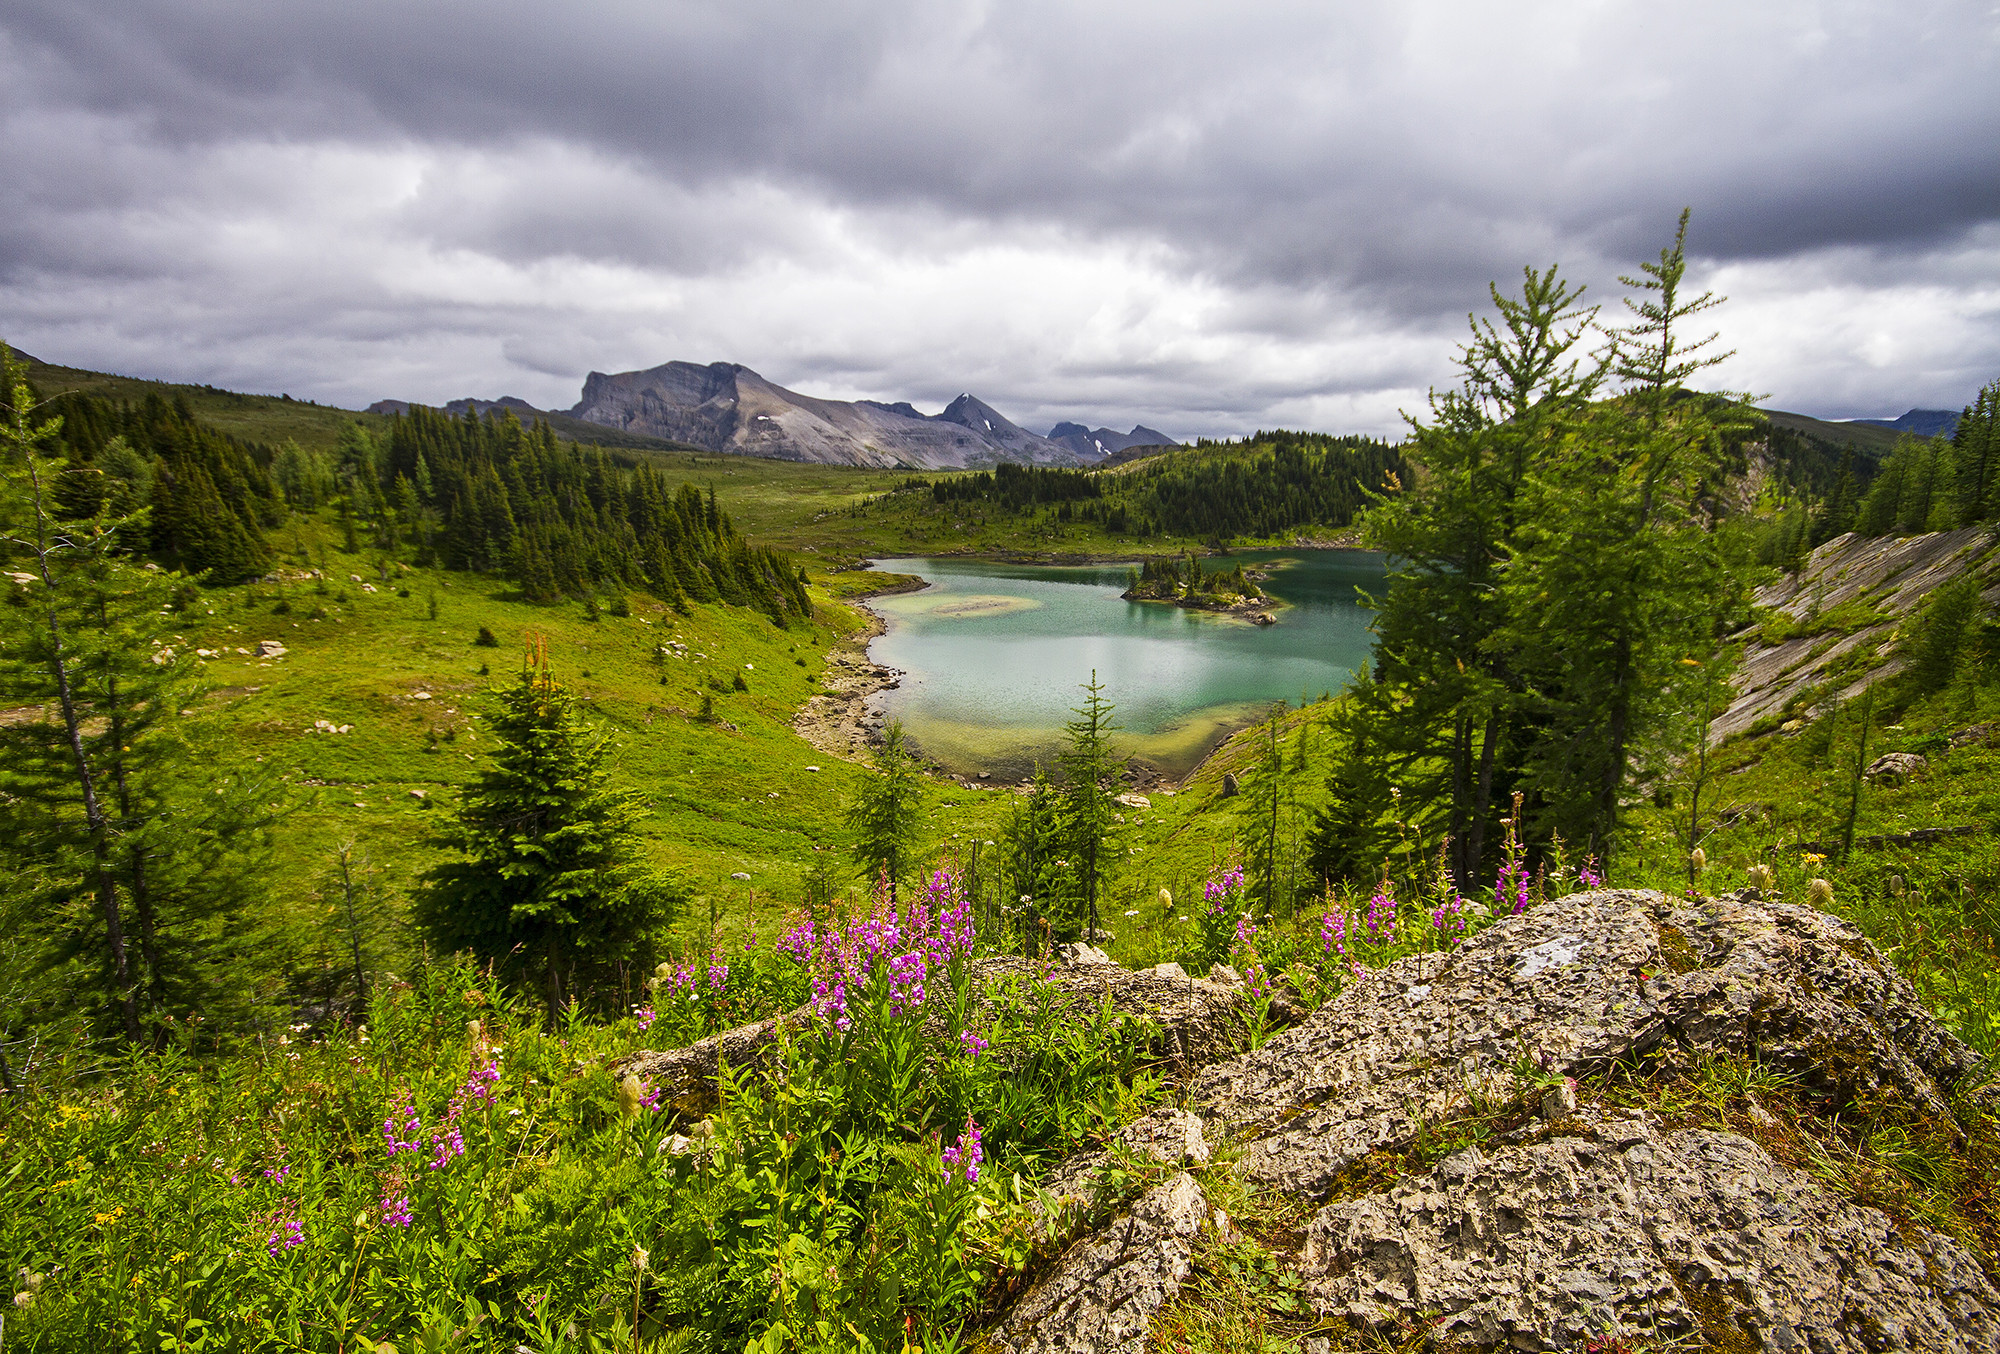 обои горы, озеро, деревья, тучи картинки фото